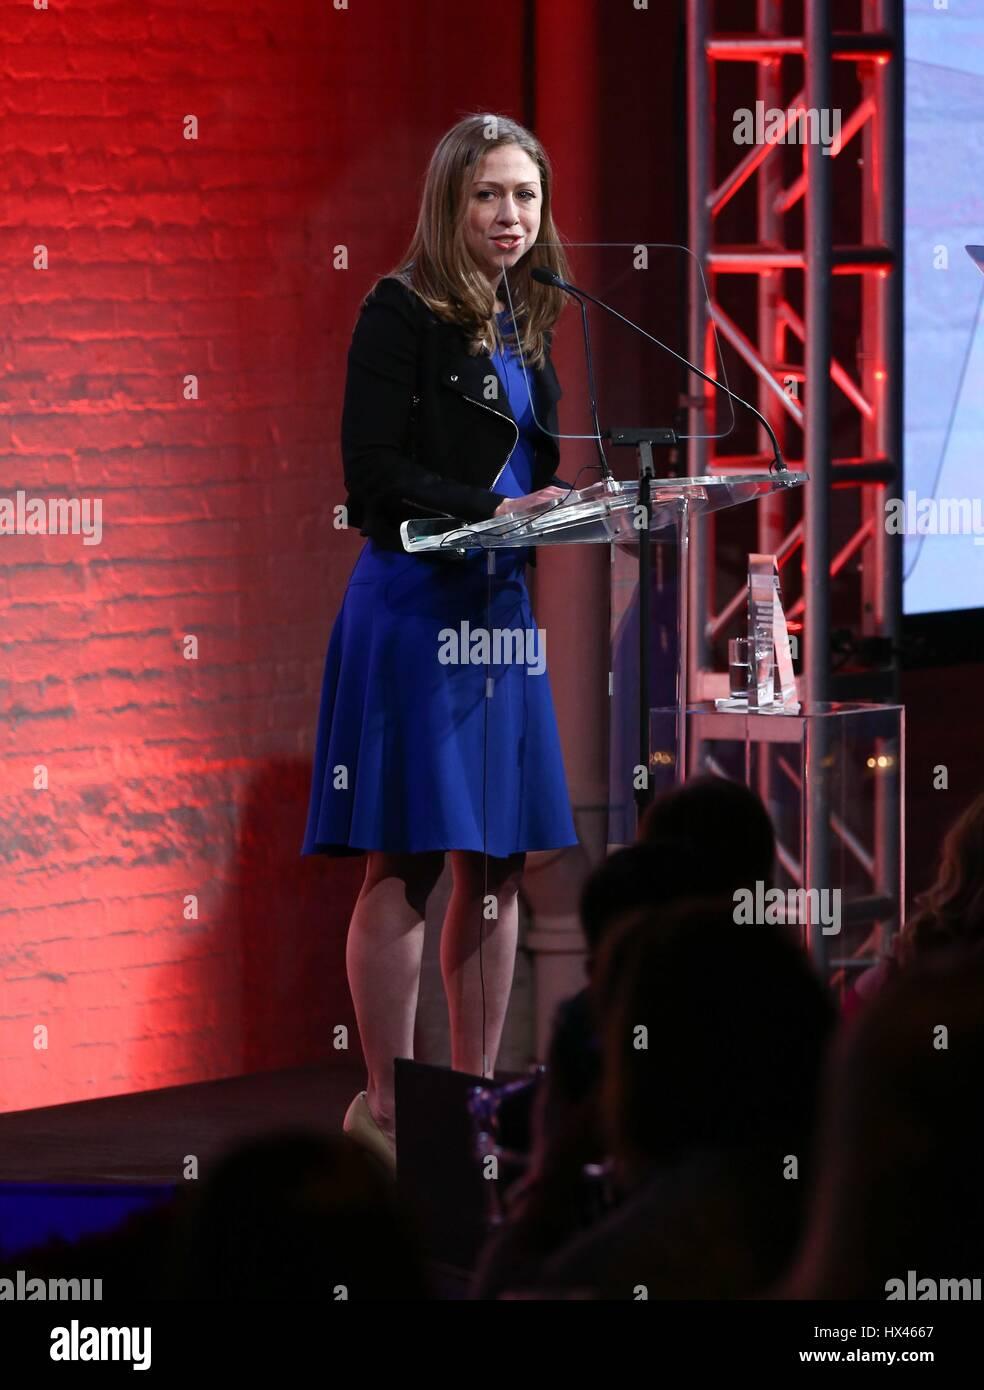 New York, NY, USA. 23. März 2017. Chelsea Clinton im Ankunftsbereich für GMHC 35. Frühling Jubiläumsgala, Stockbild